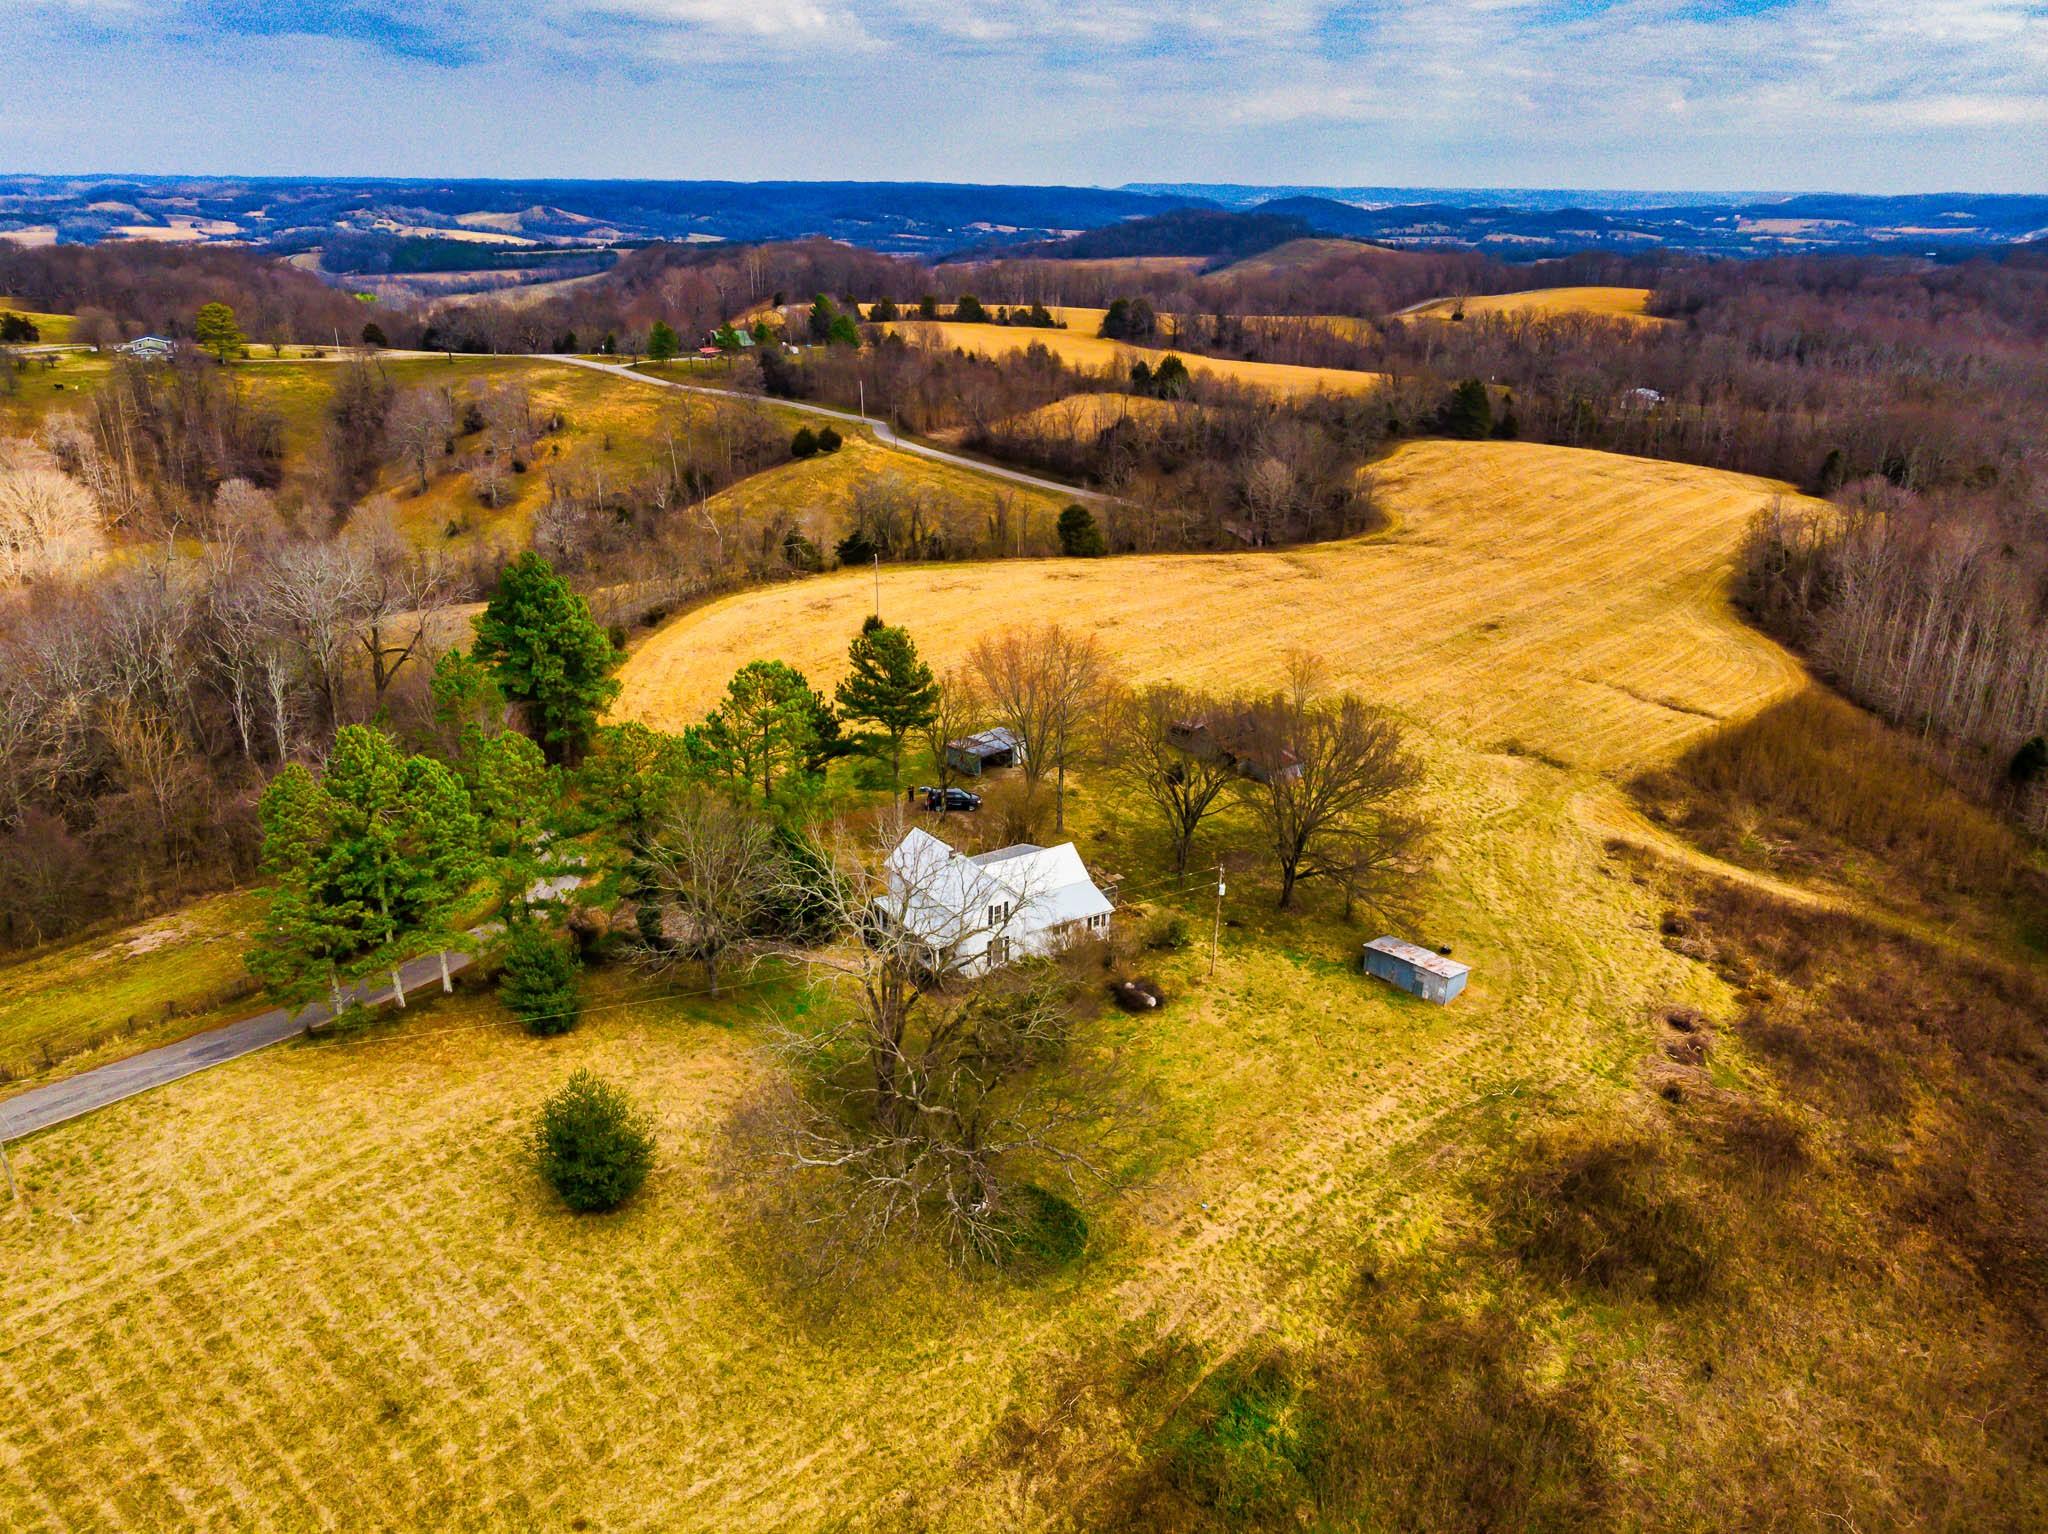 412 Carroll Ridge Rd, Pulaski, Tennessee 38478, ,Farm And Agriculture,For Sale,412 Carroll Ridge Rd,2226121